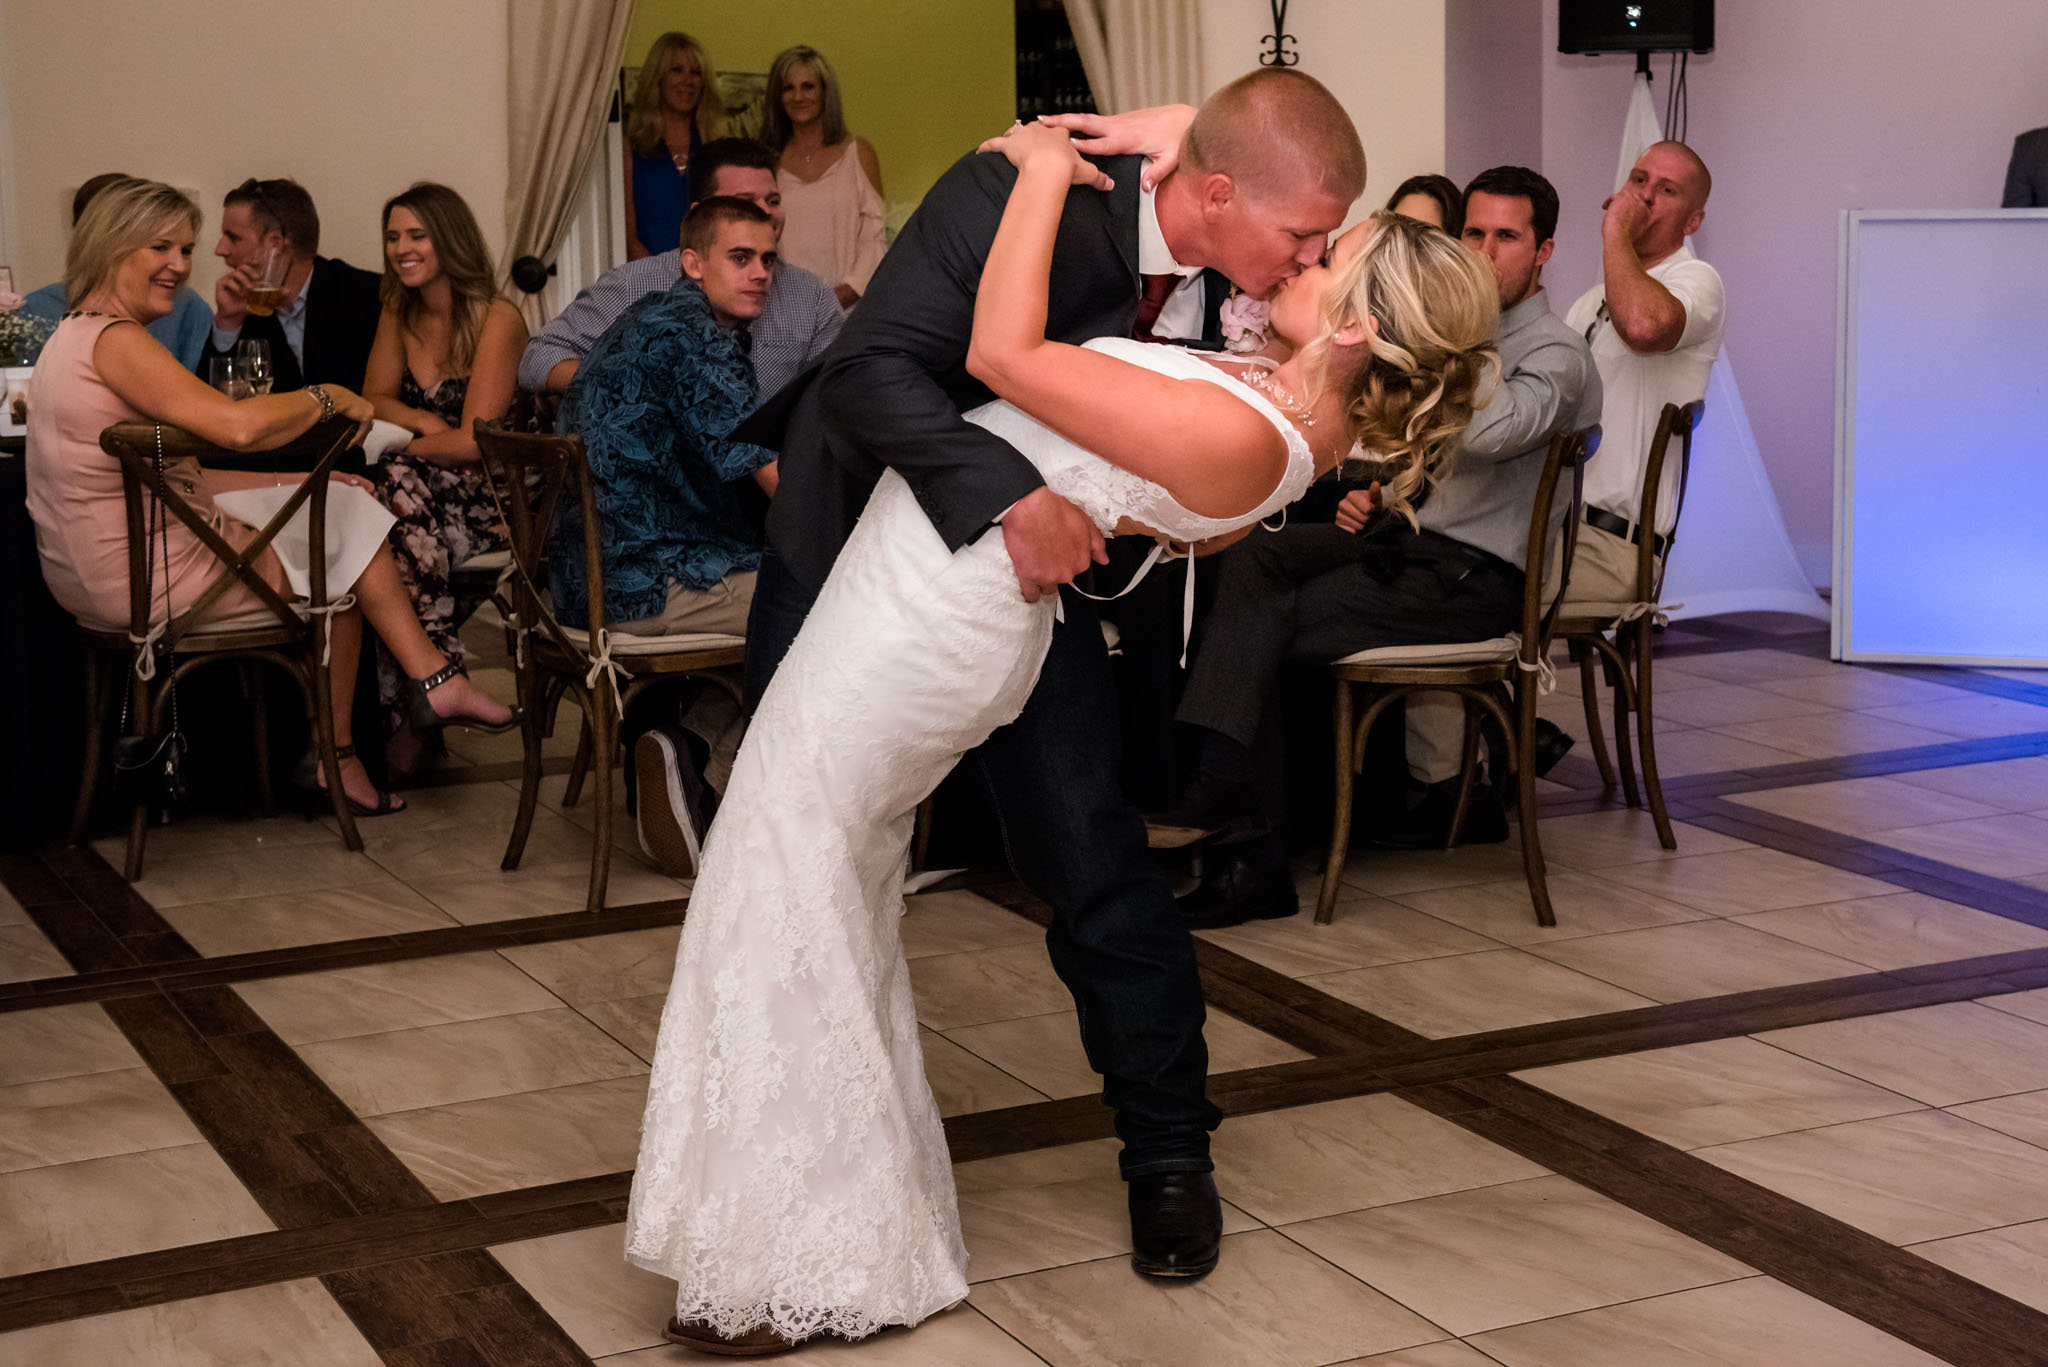 Avensole-Winery-Temecula-Wedding-Josh-and-Olivia-4012.JPG